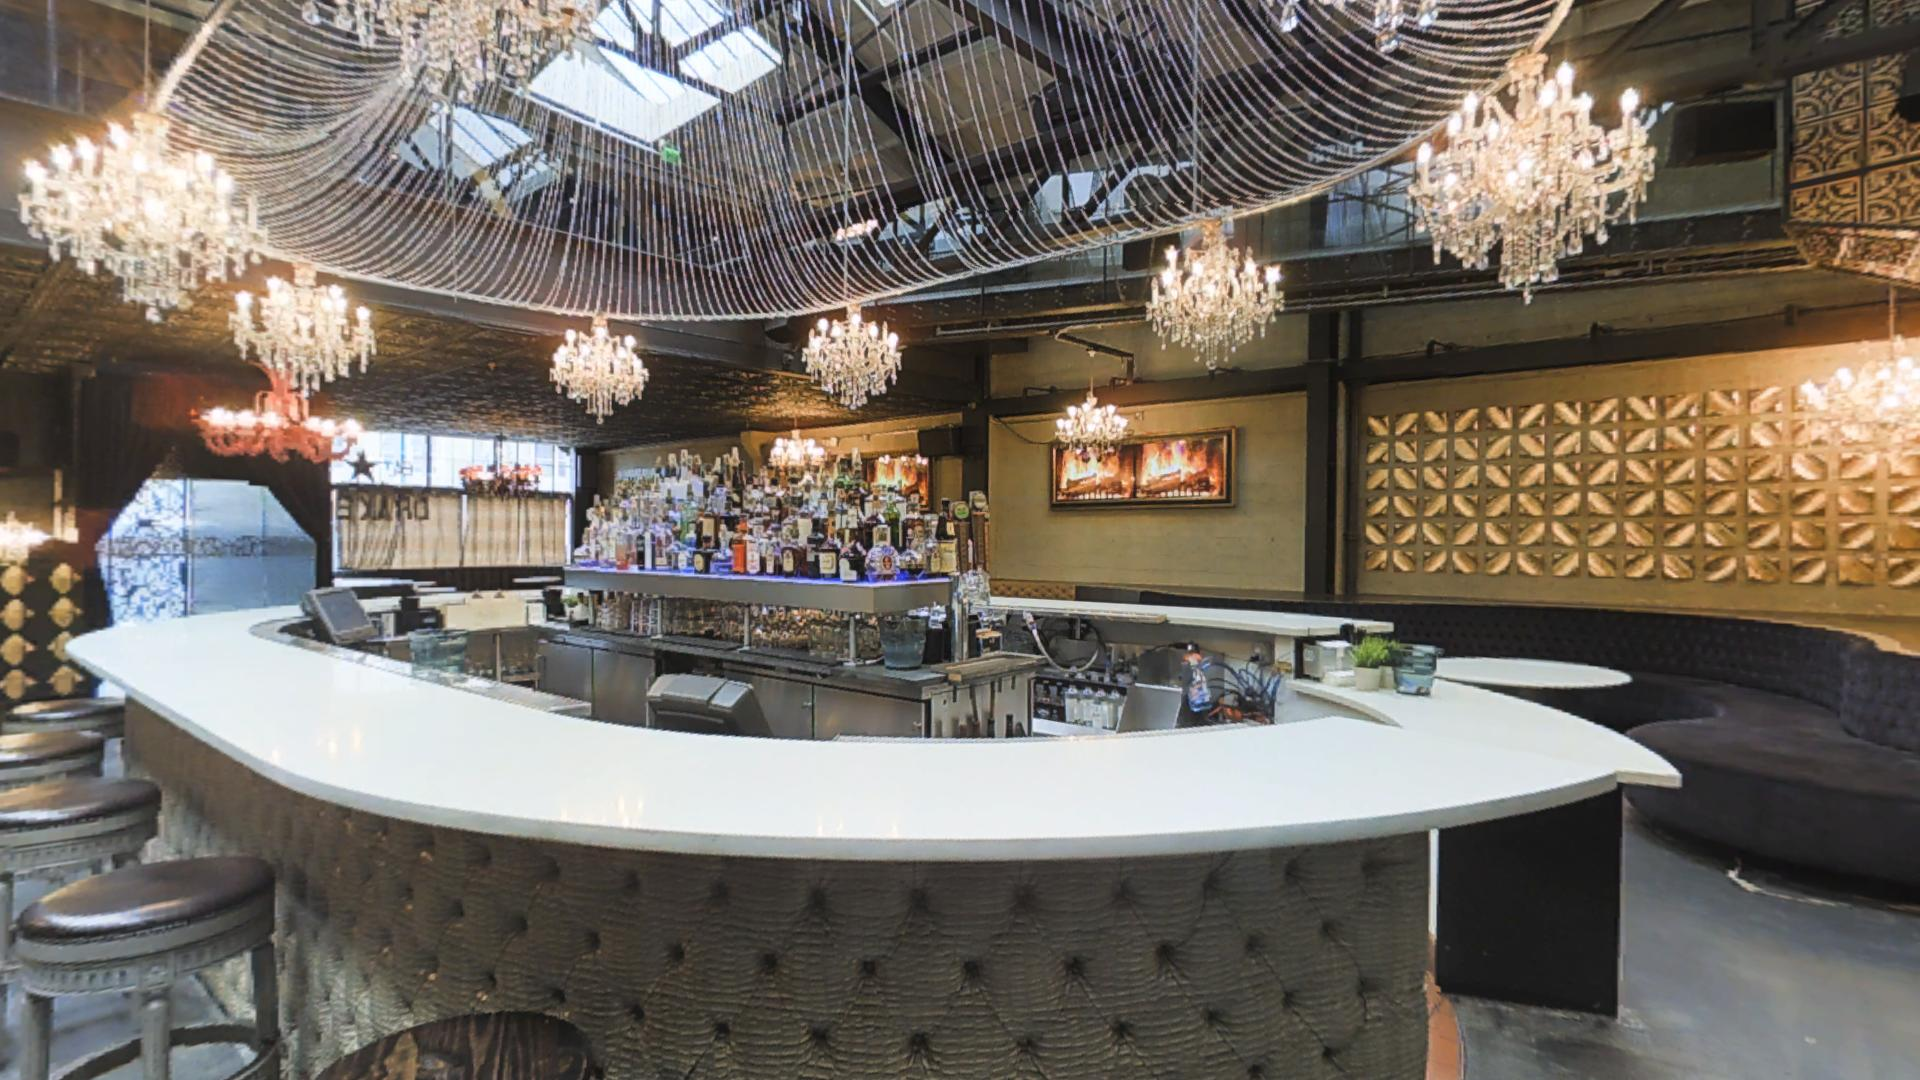 Drake Restaurant, Bar & Lounge